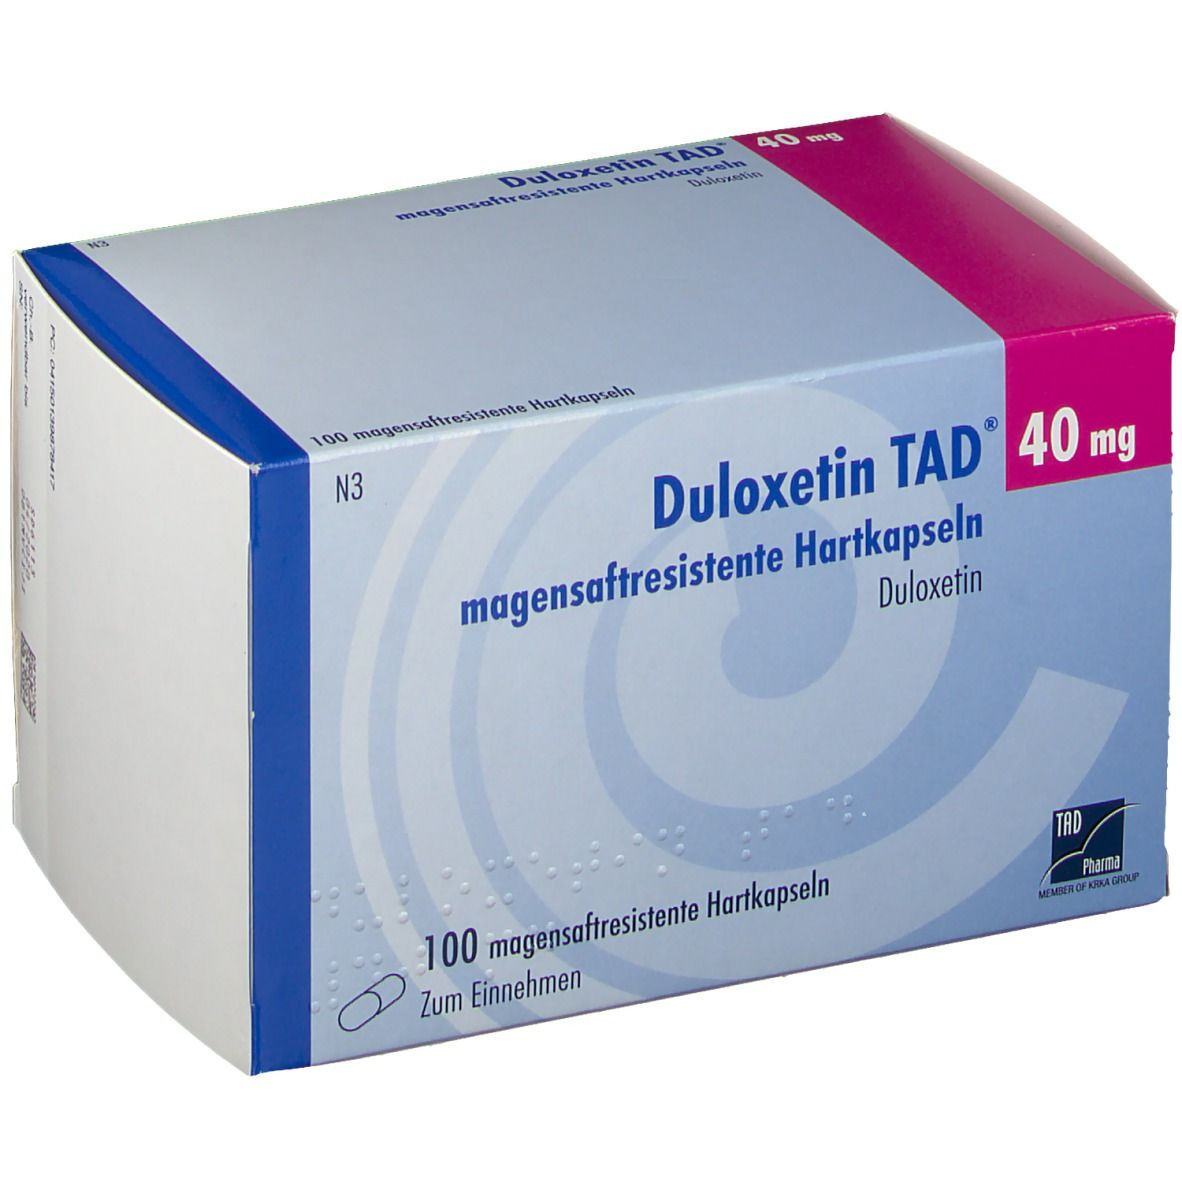 DULOXETIN TAD 40 mg magensaftresistente Hartkaps.